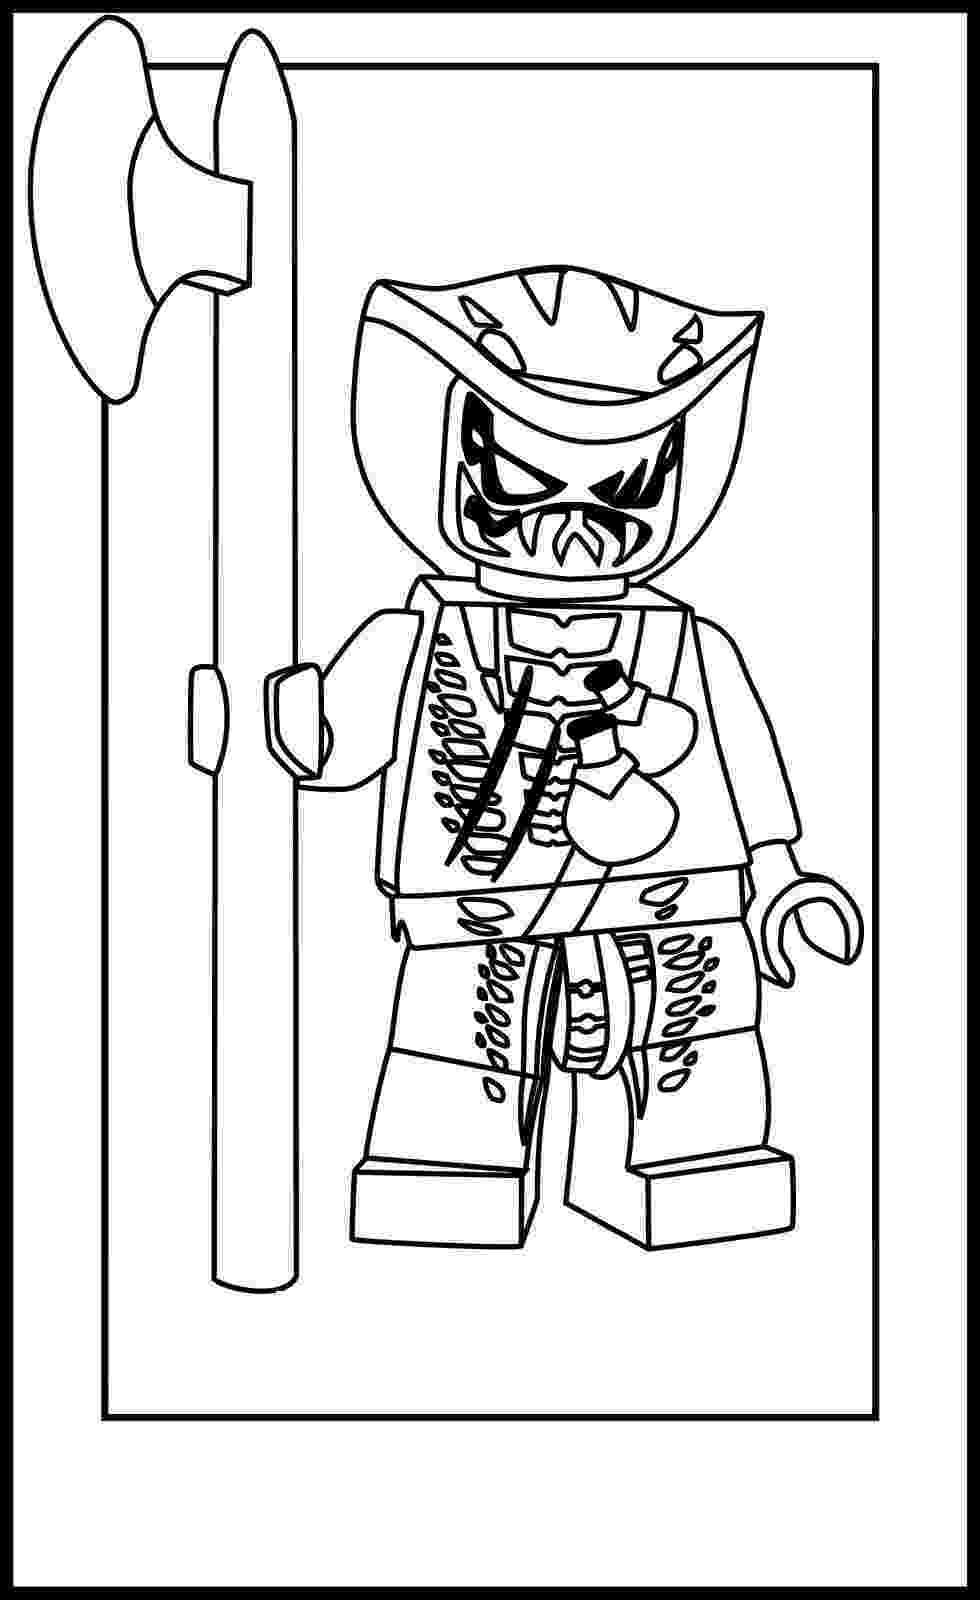 lego ninjago pictures lego ninjago coloring pages fantasy coloring pages ninjago lego pictures